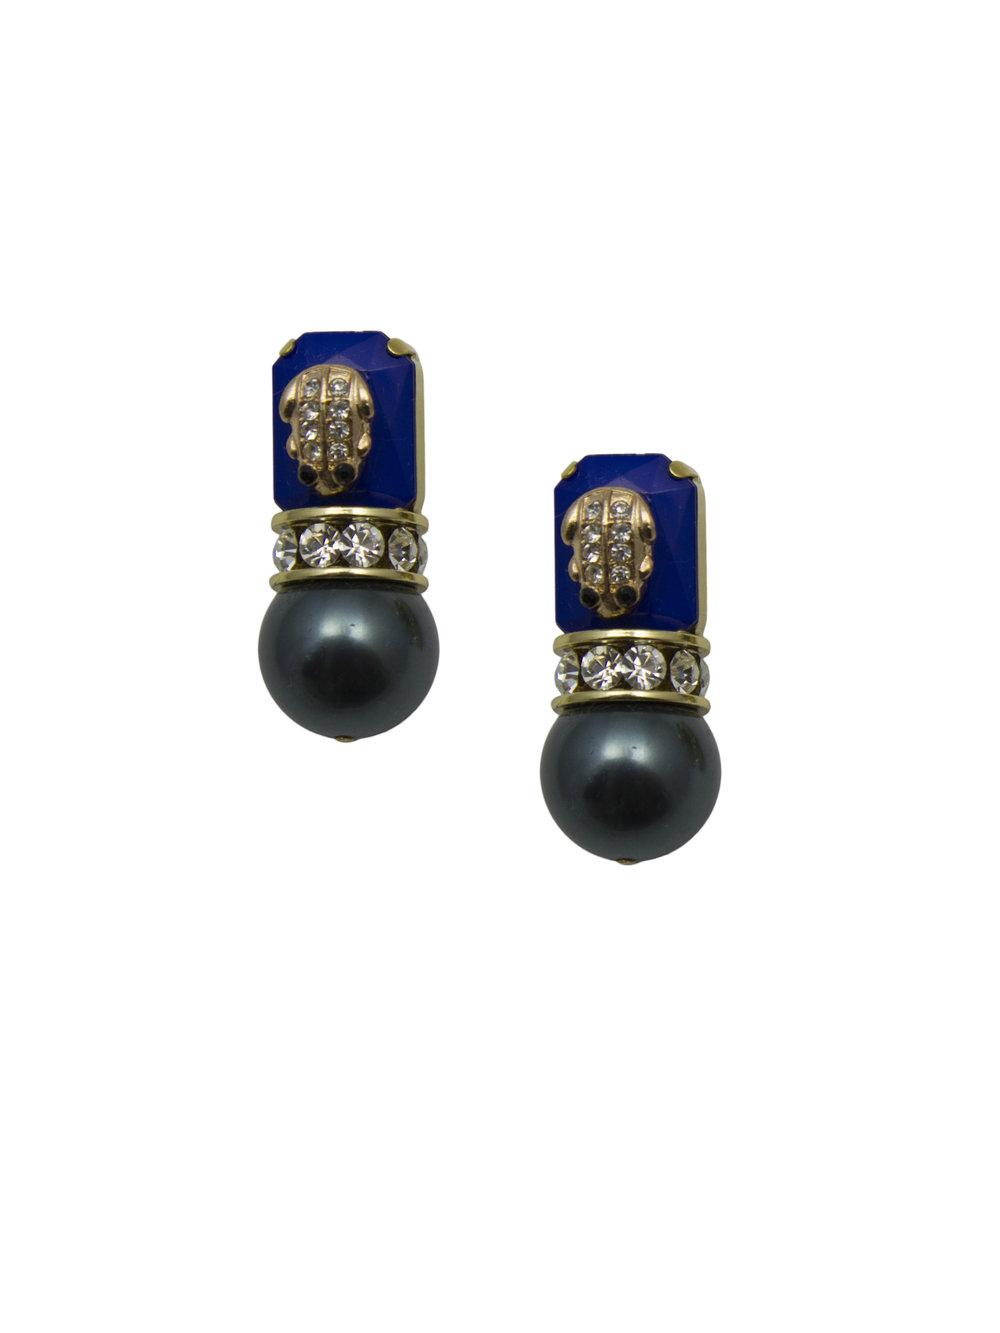 229E Blue & Gold Military Tahitian Pearl Stud Earrings.jpg